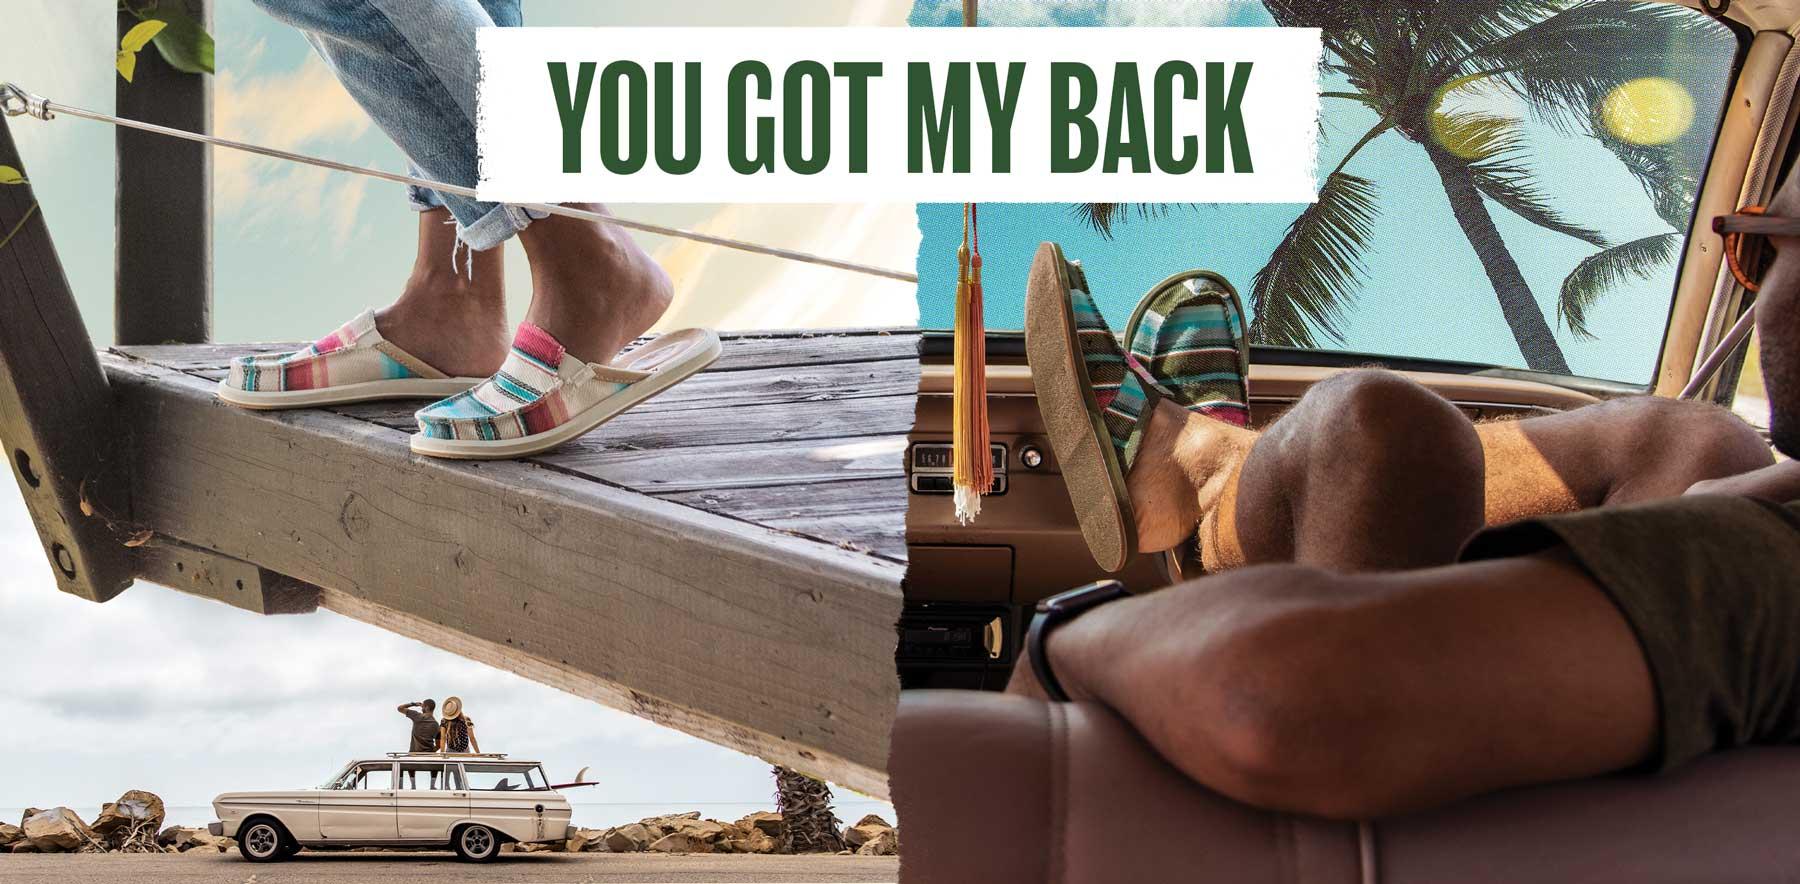 You Got My Back